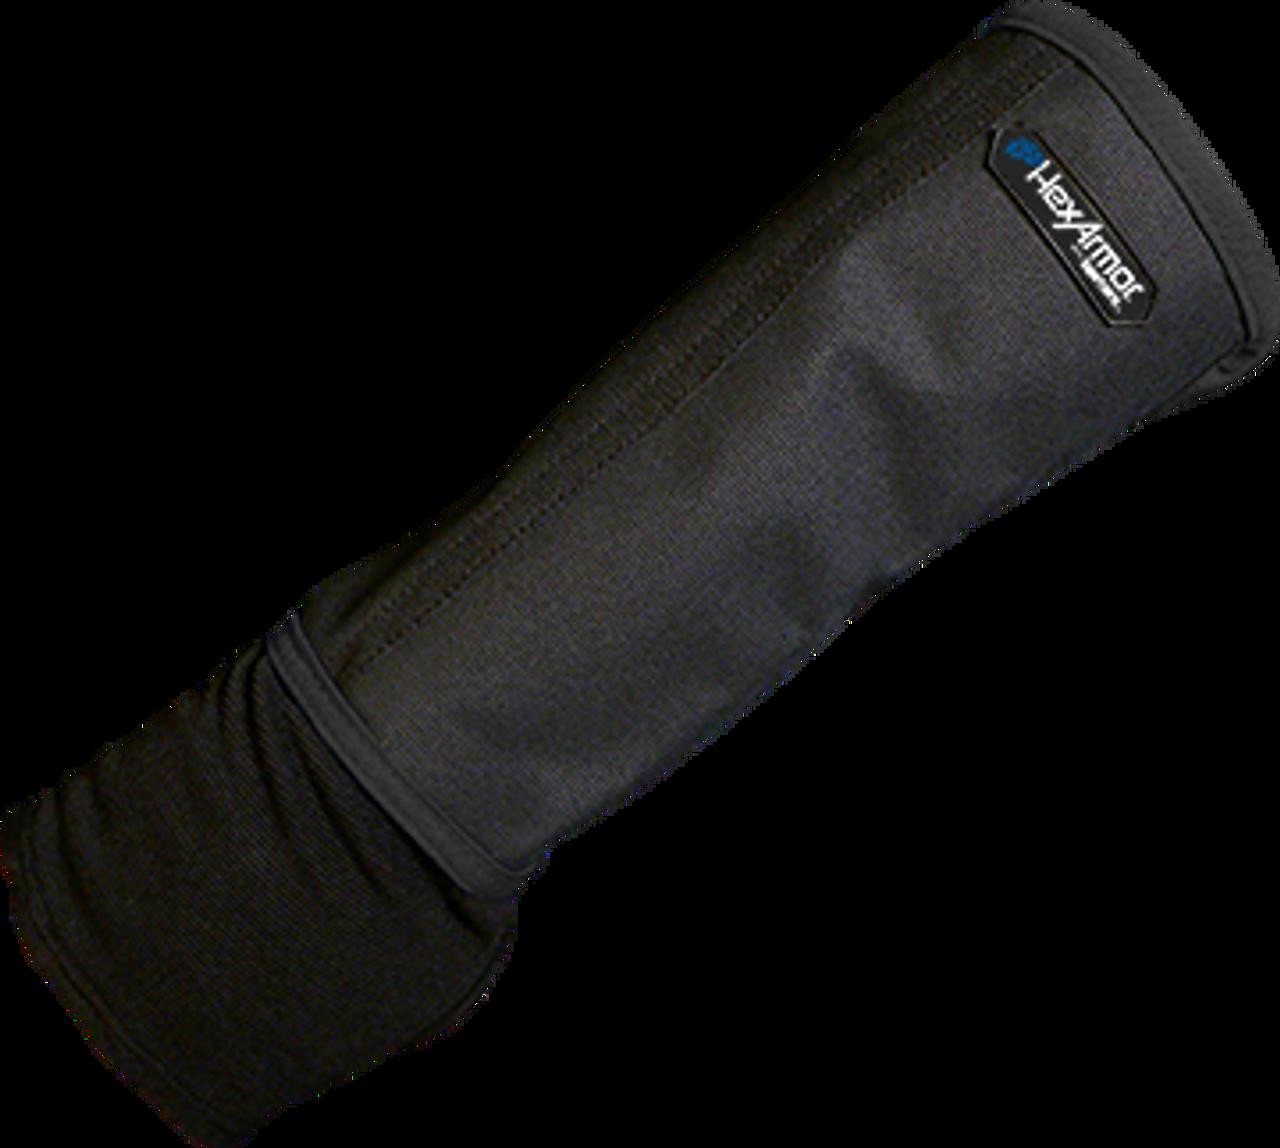 Needle Resistant Sleeves